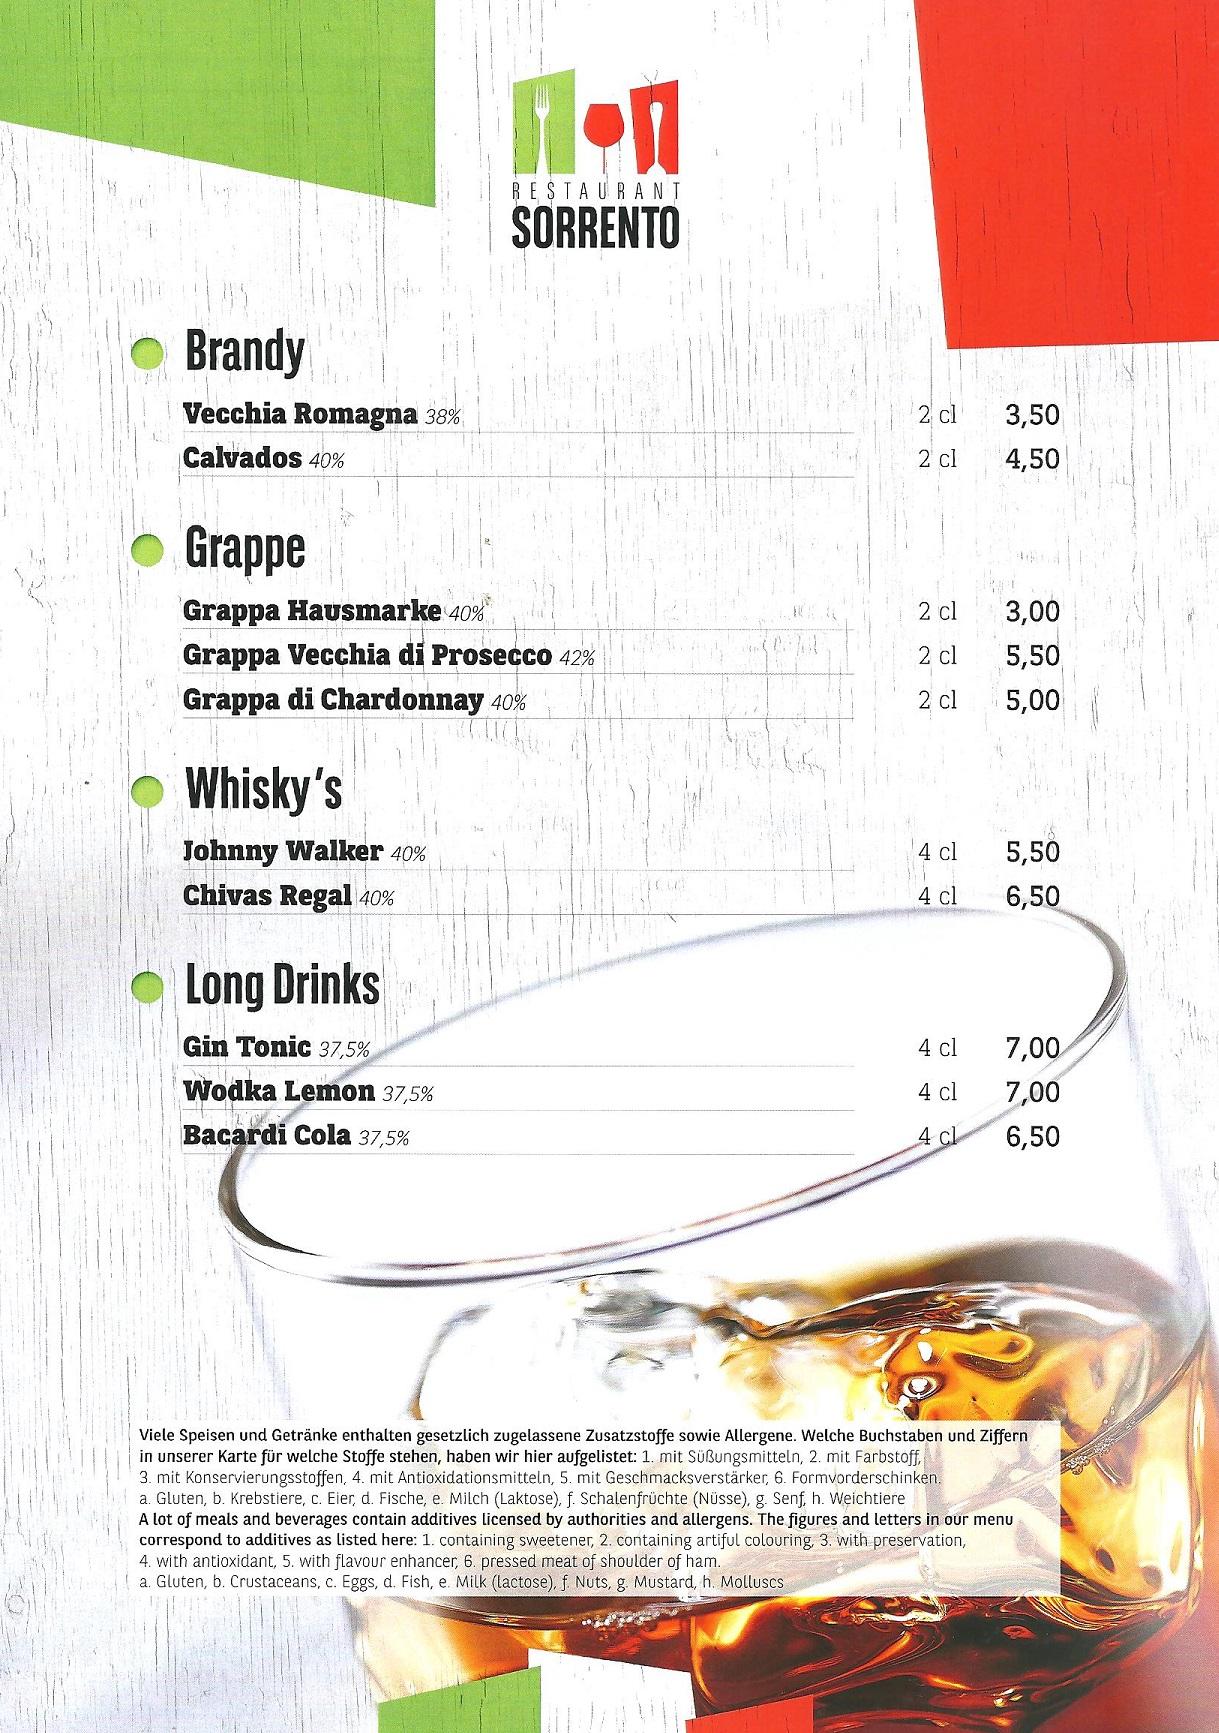 Brandy / Grappa / Whisky / Long Drings